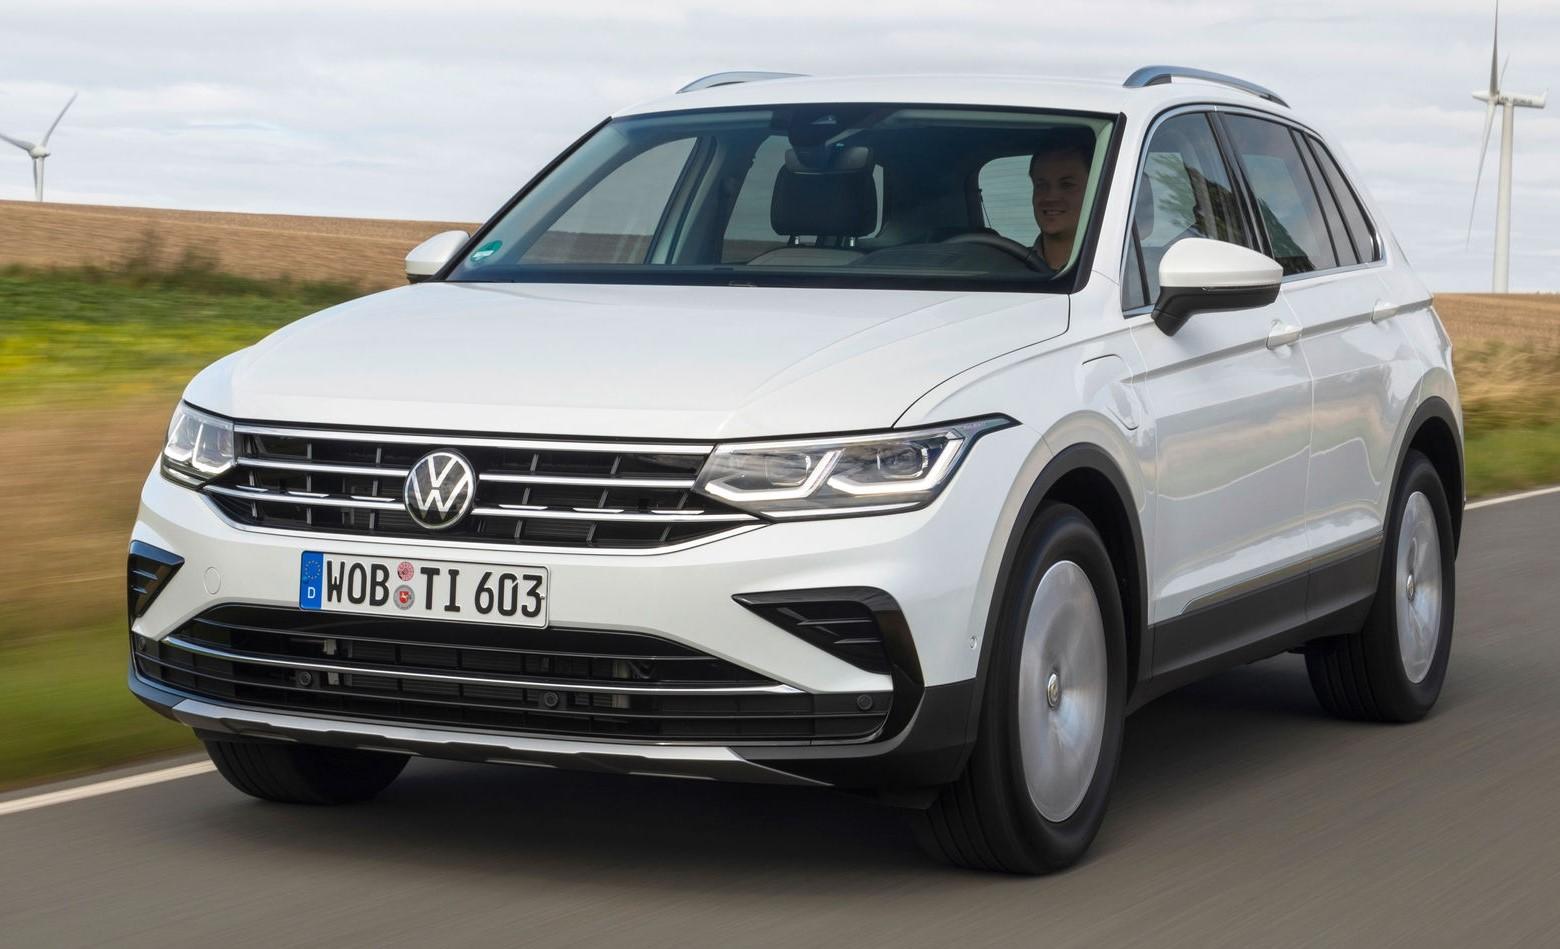 Volkswagen Tiguan eHybrid joins the range